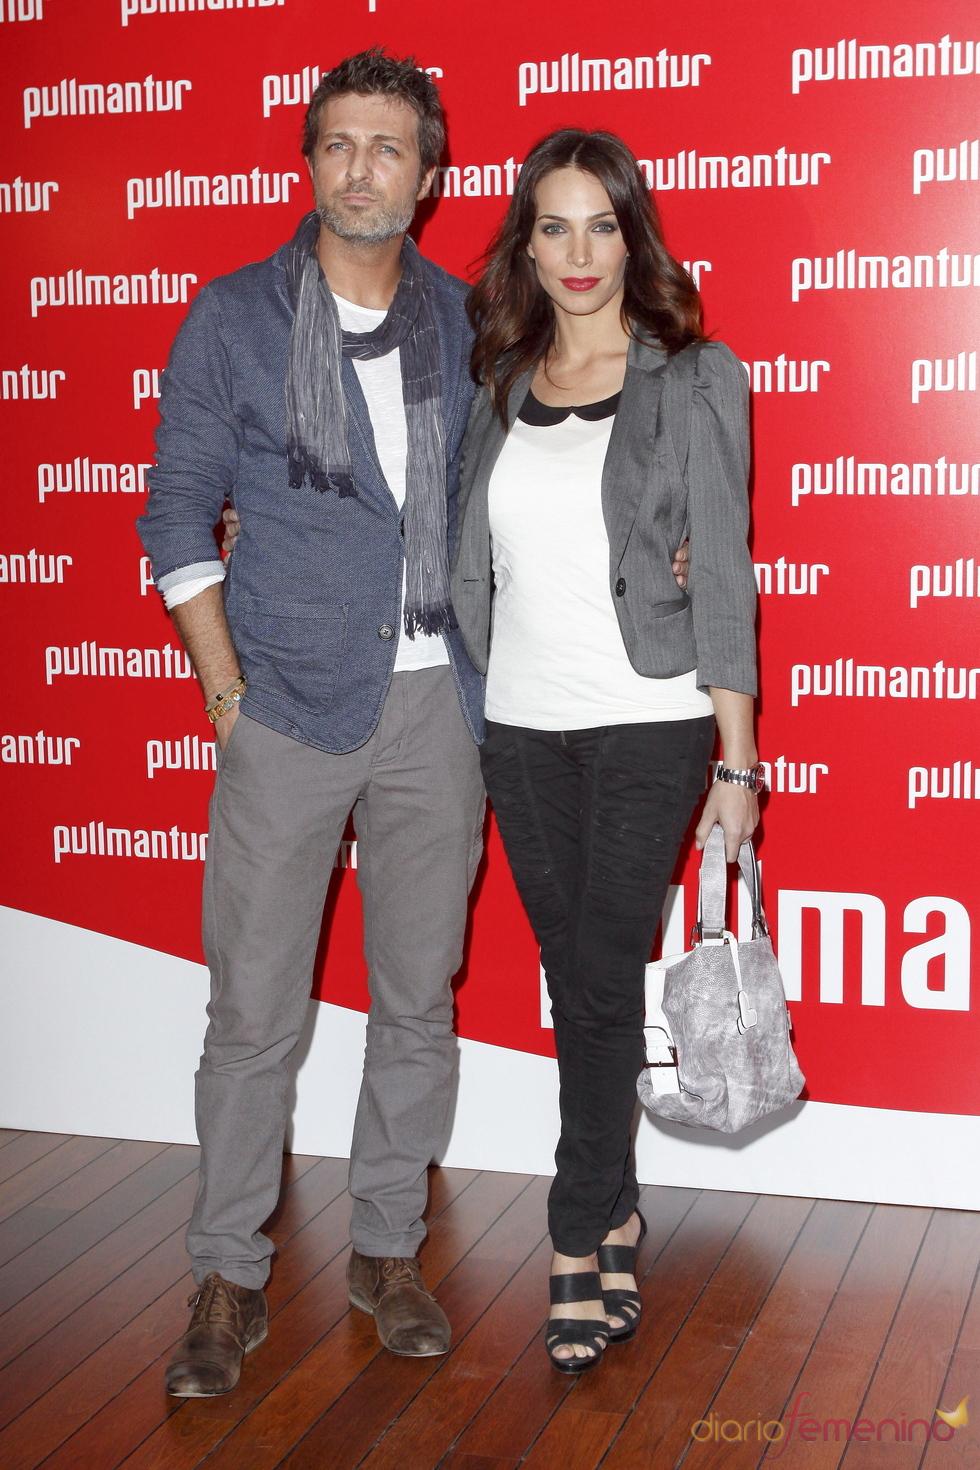 Jesús Olmedo y Nerea Garmendia en la fiesta 'Pullmantur'